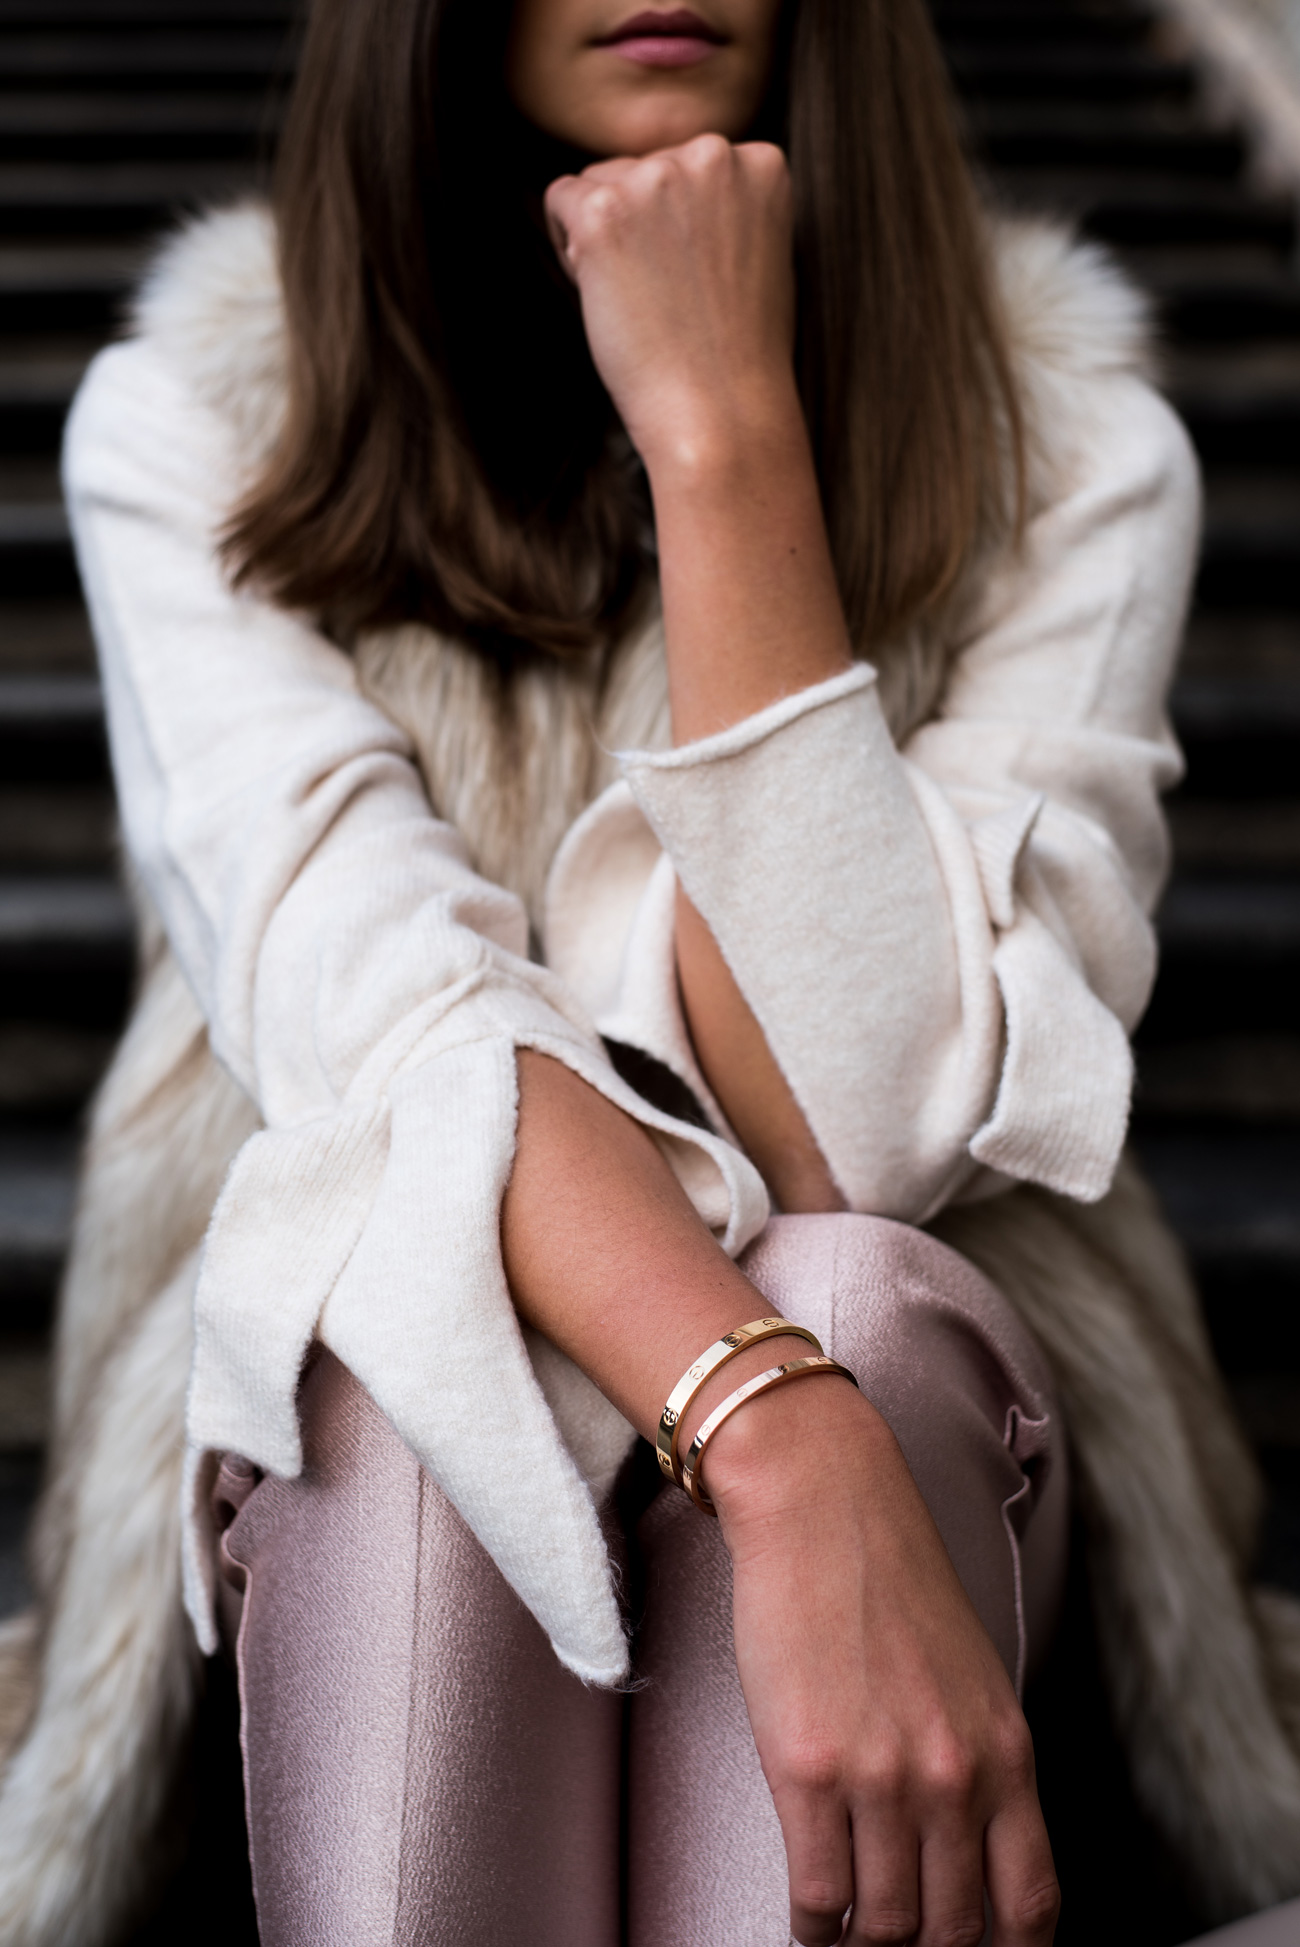 cartier-love-armband-launch-februar-2017-dünneres-armband-blogger-kampagne-deutschland-fashiioncarpet